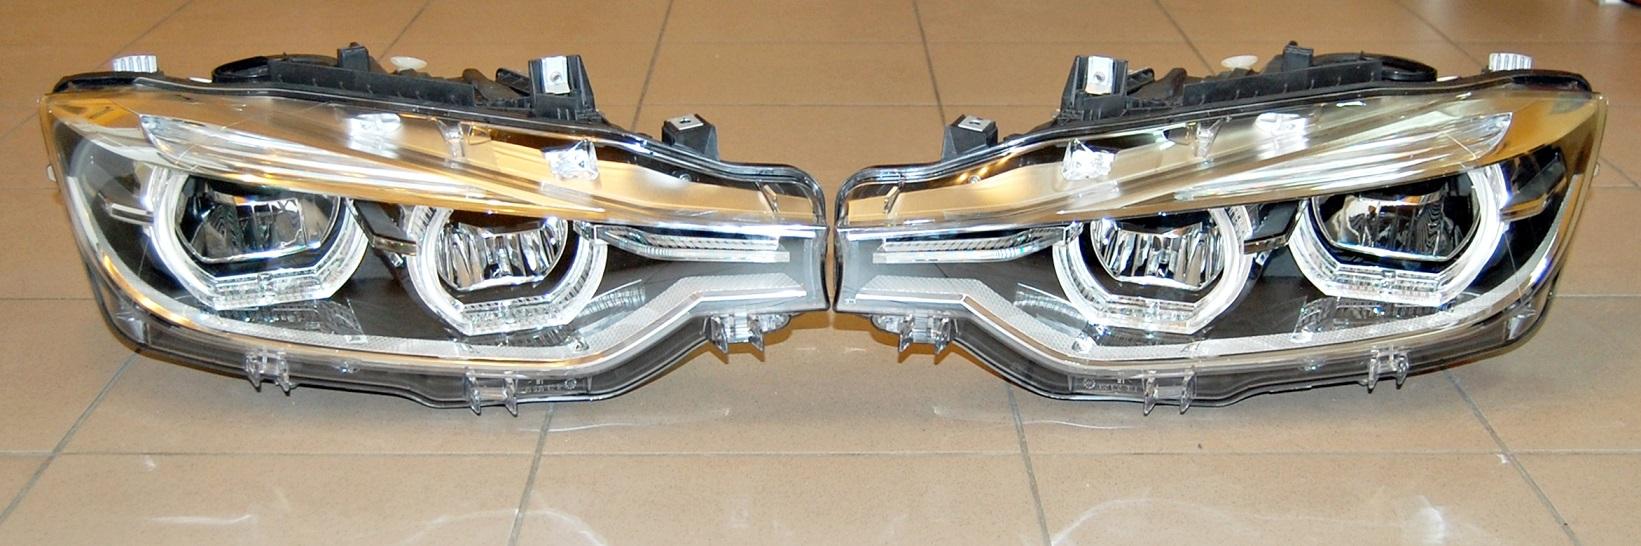 bmw halogen headlights led vehicles helix conversion itm series